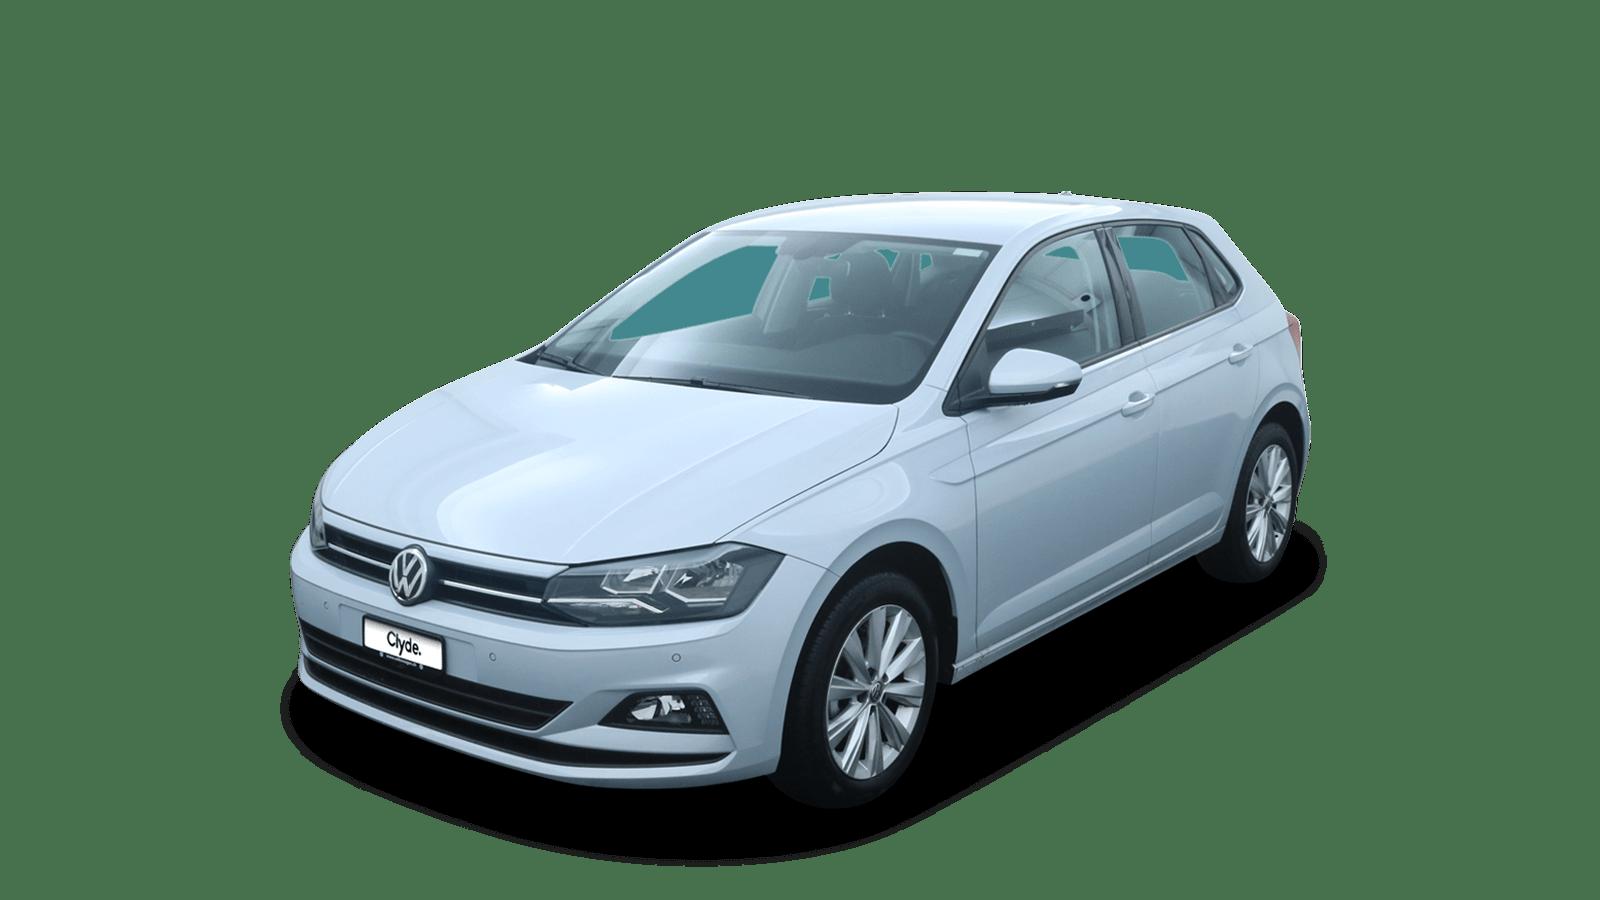 VW Polo Silver front - Clyde car subscription